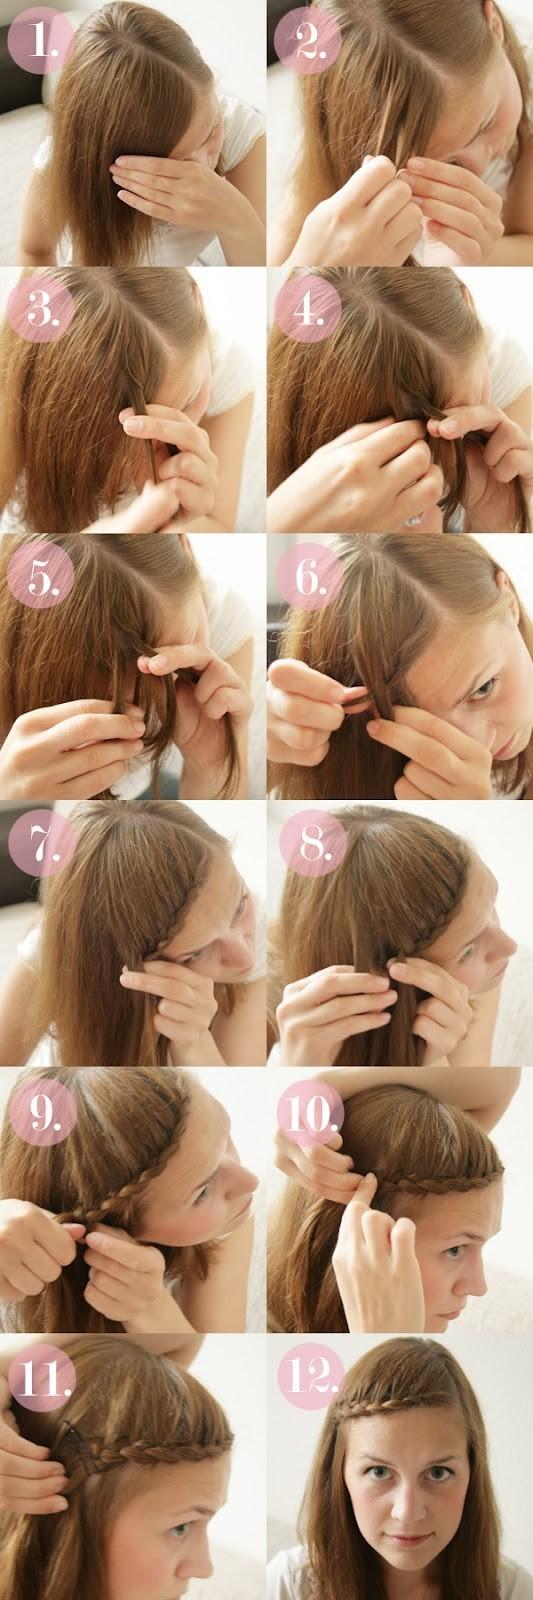 Remarkable 15 Braided Bangs Tutorials Cute Easy Hairstyles Pretty Designs Hairstyles For Men Maxibearus